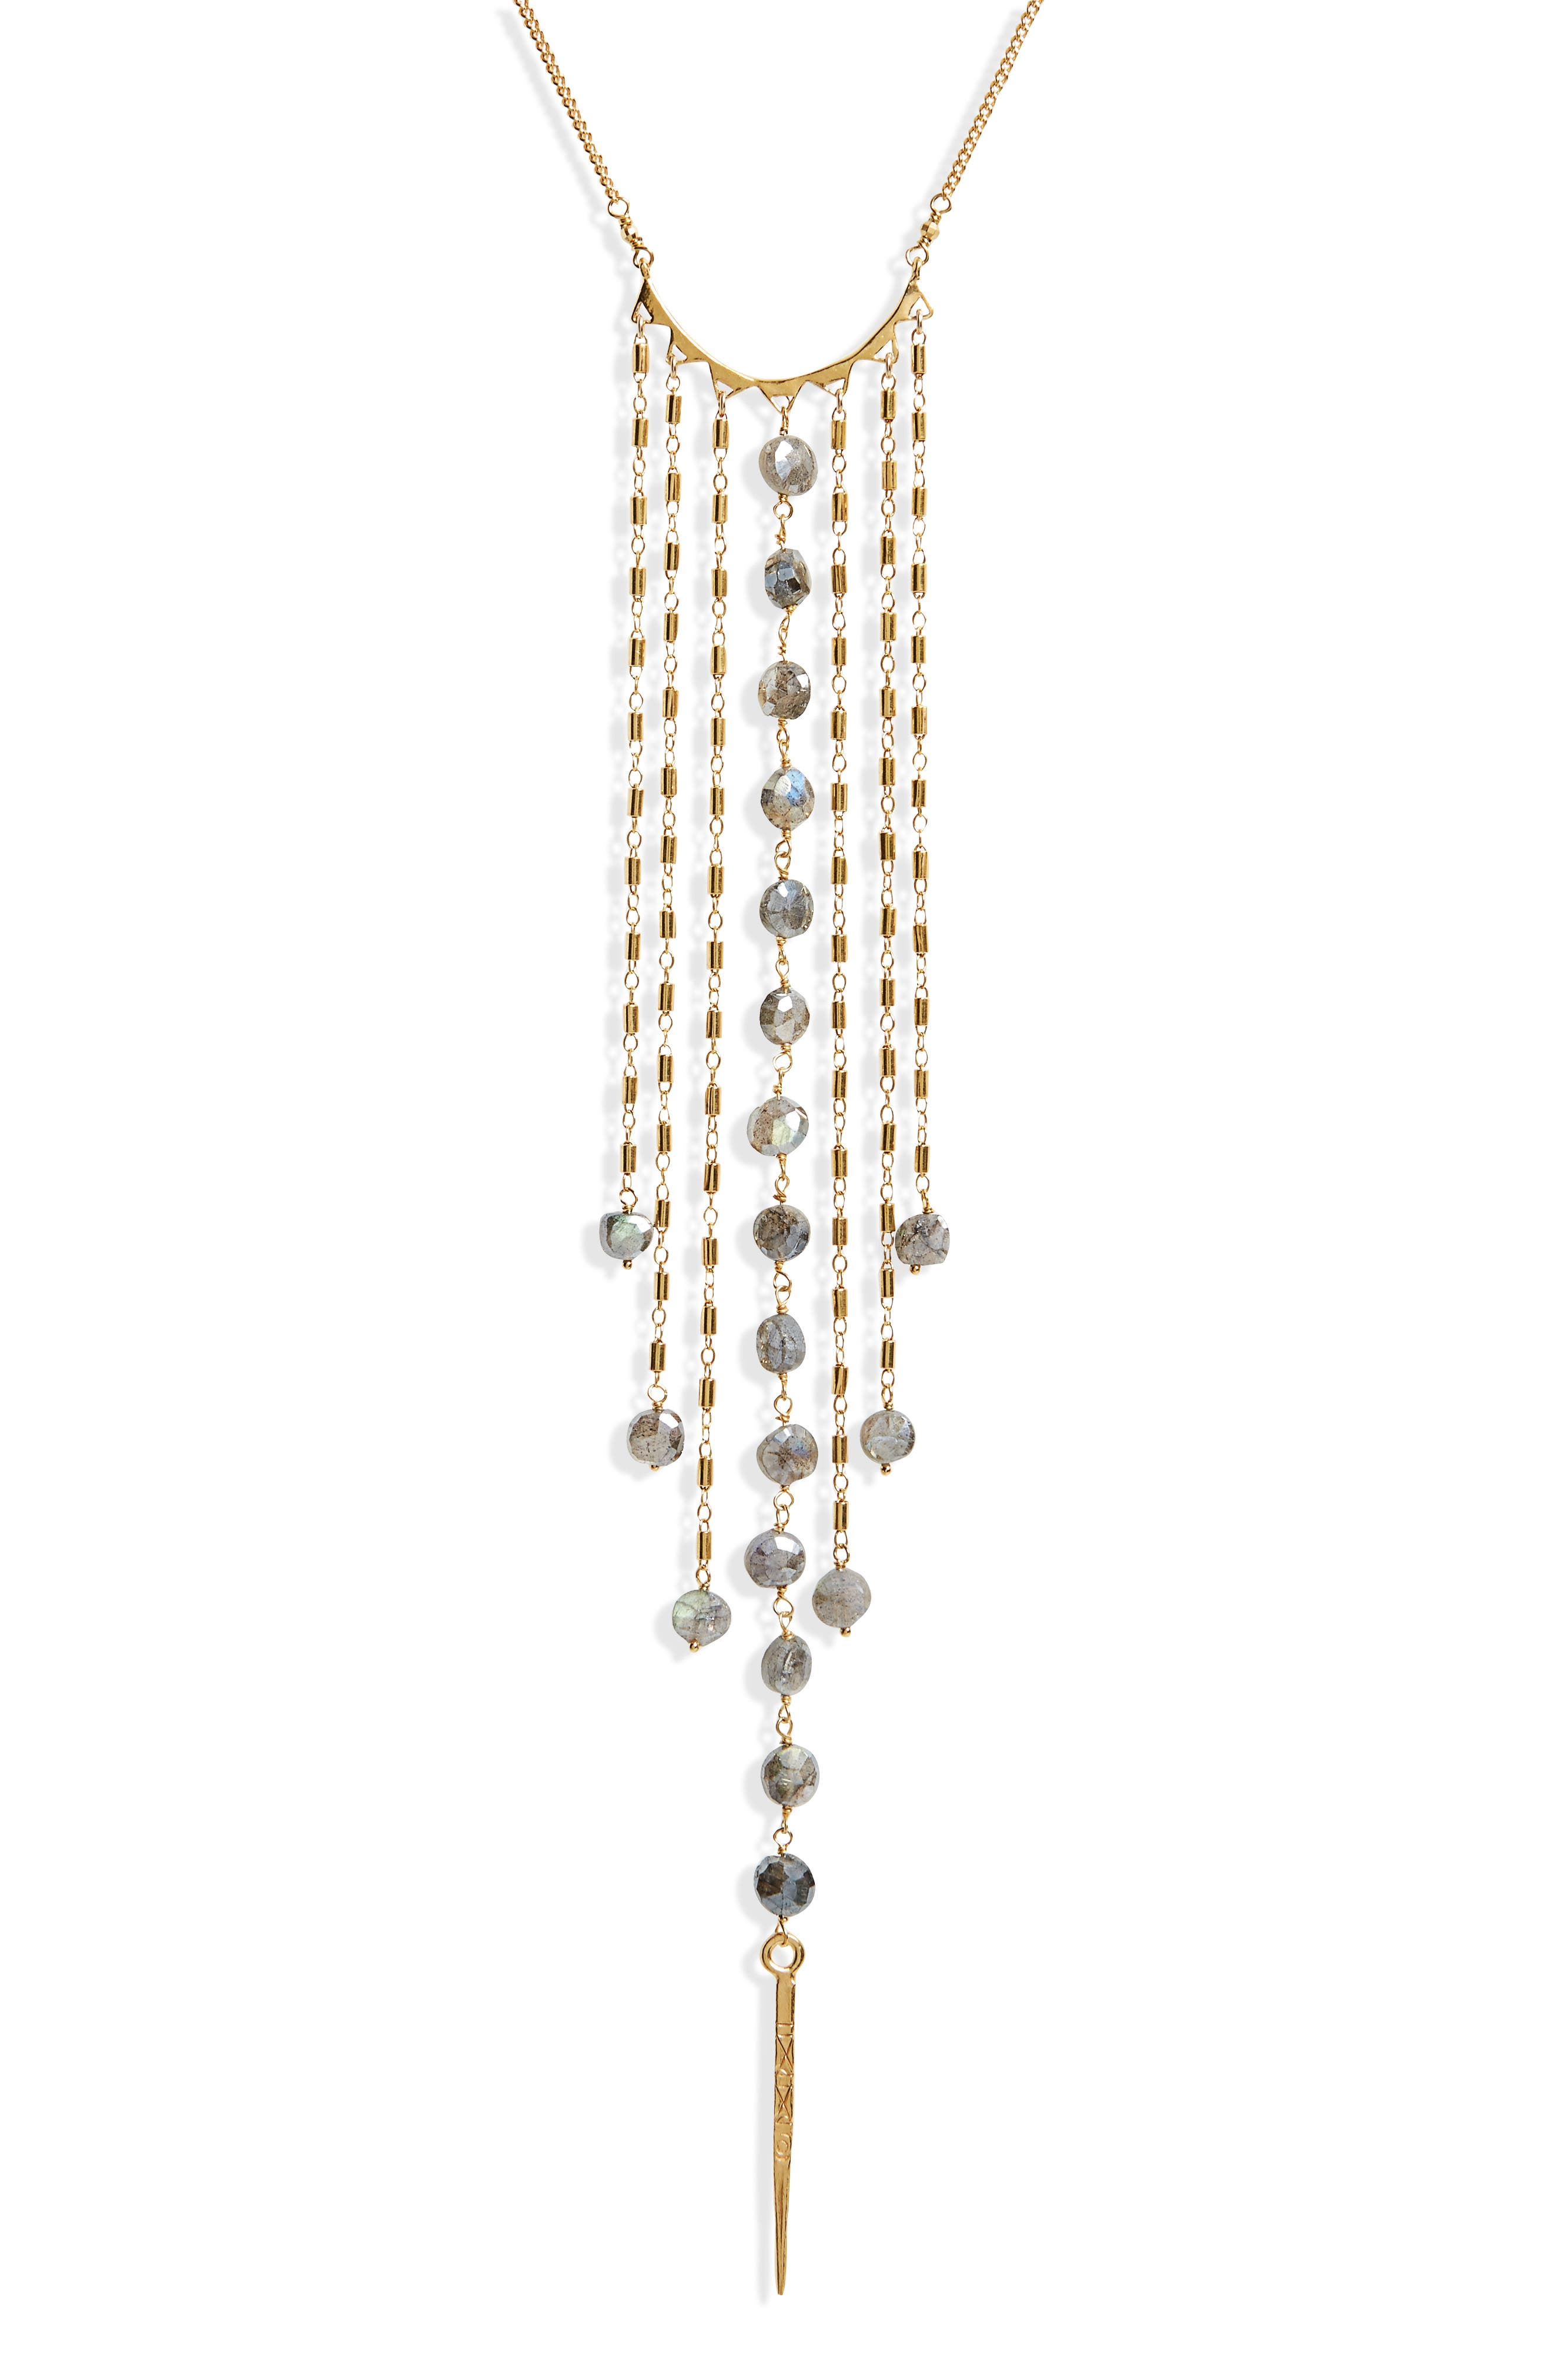 Mystic Labradorite Fringe Necklace,                             Alternate thumbnail 2, color,                             Mystic Lab/ Gold